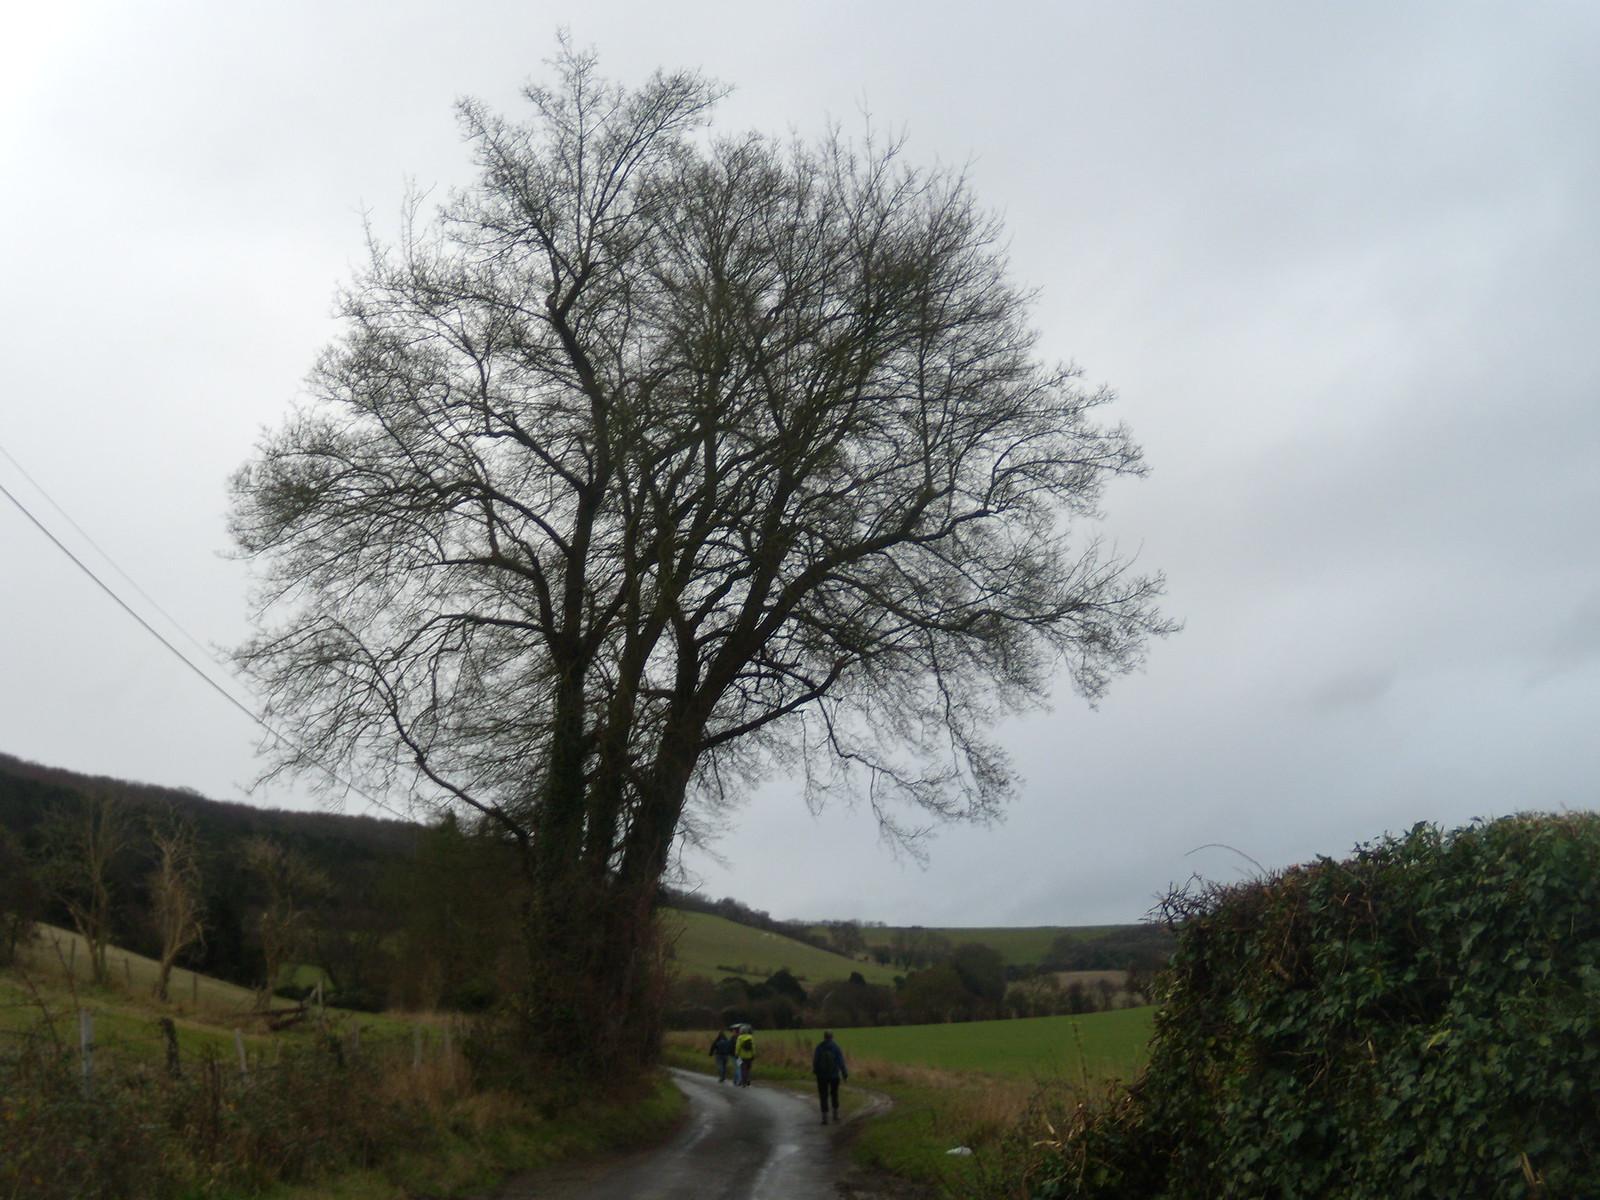 Past a lone tree Eynsford to Shoreham